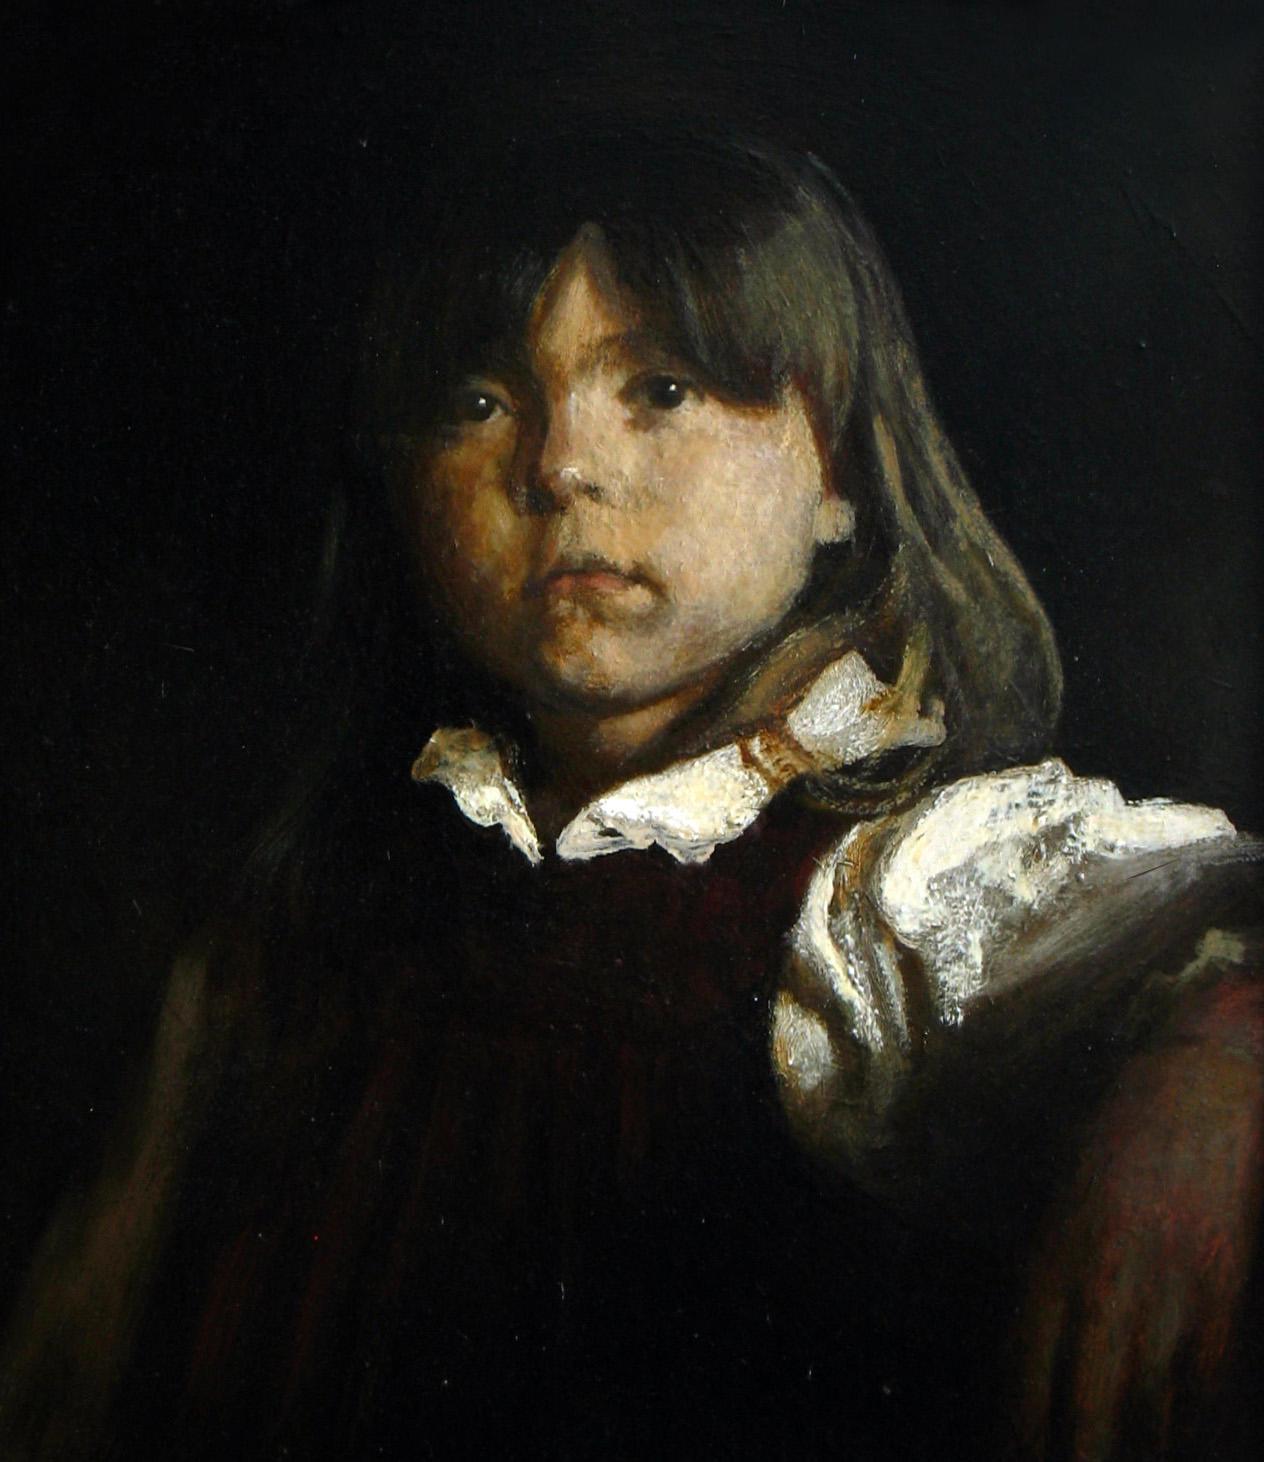 Emmi, daughter 2010